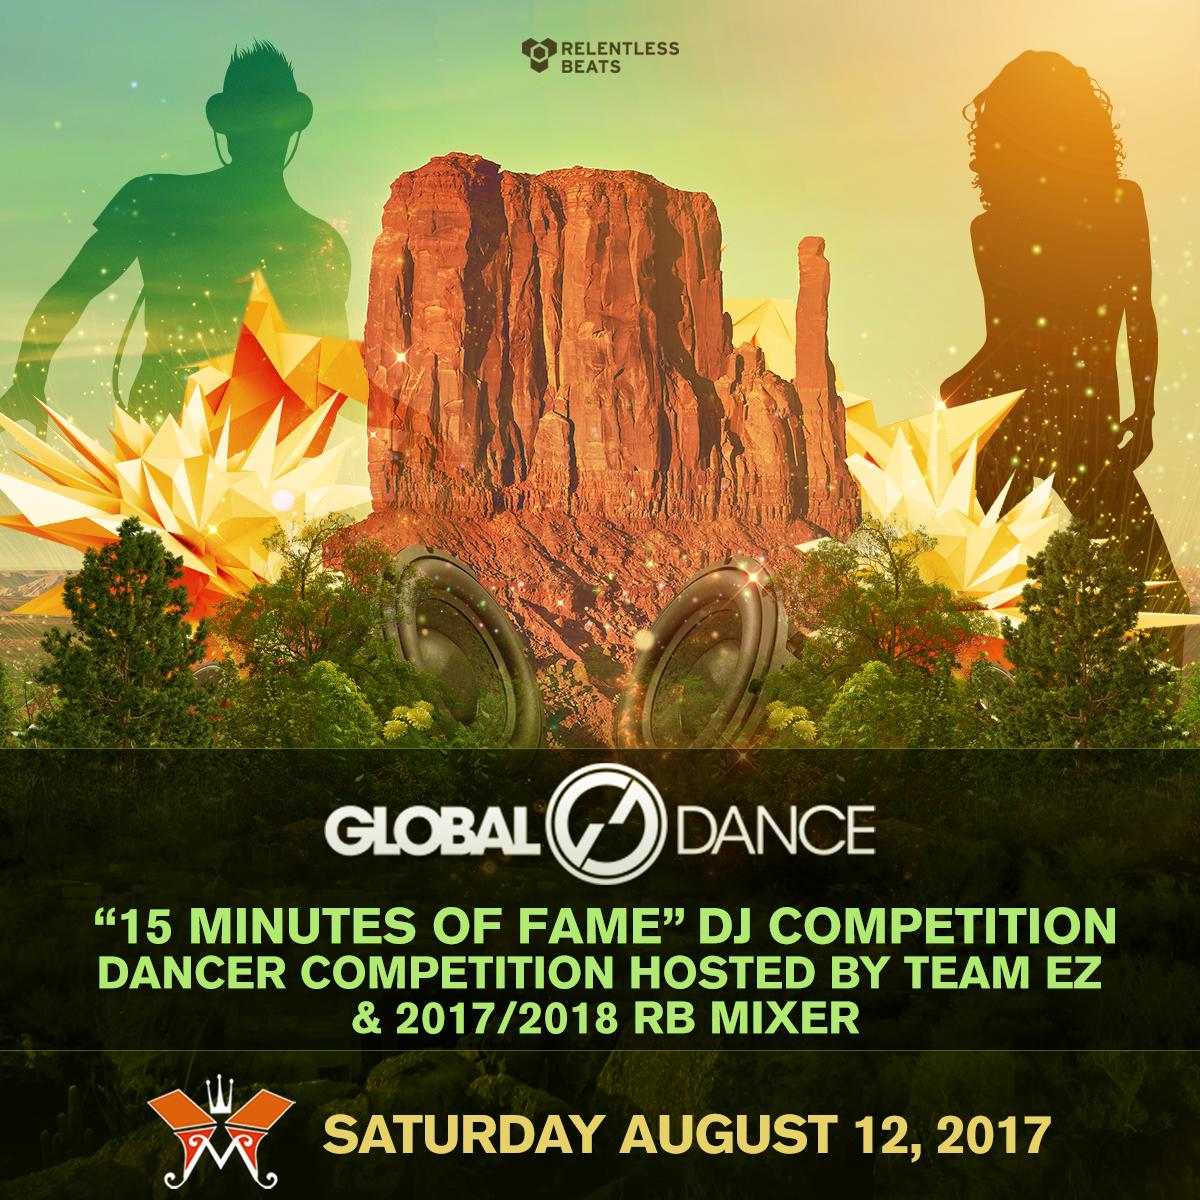 Flyer for Global Dance 15 Minutes of Fame DJ Competition & Dancer Competition